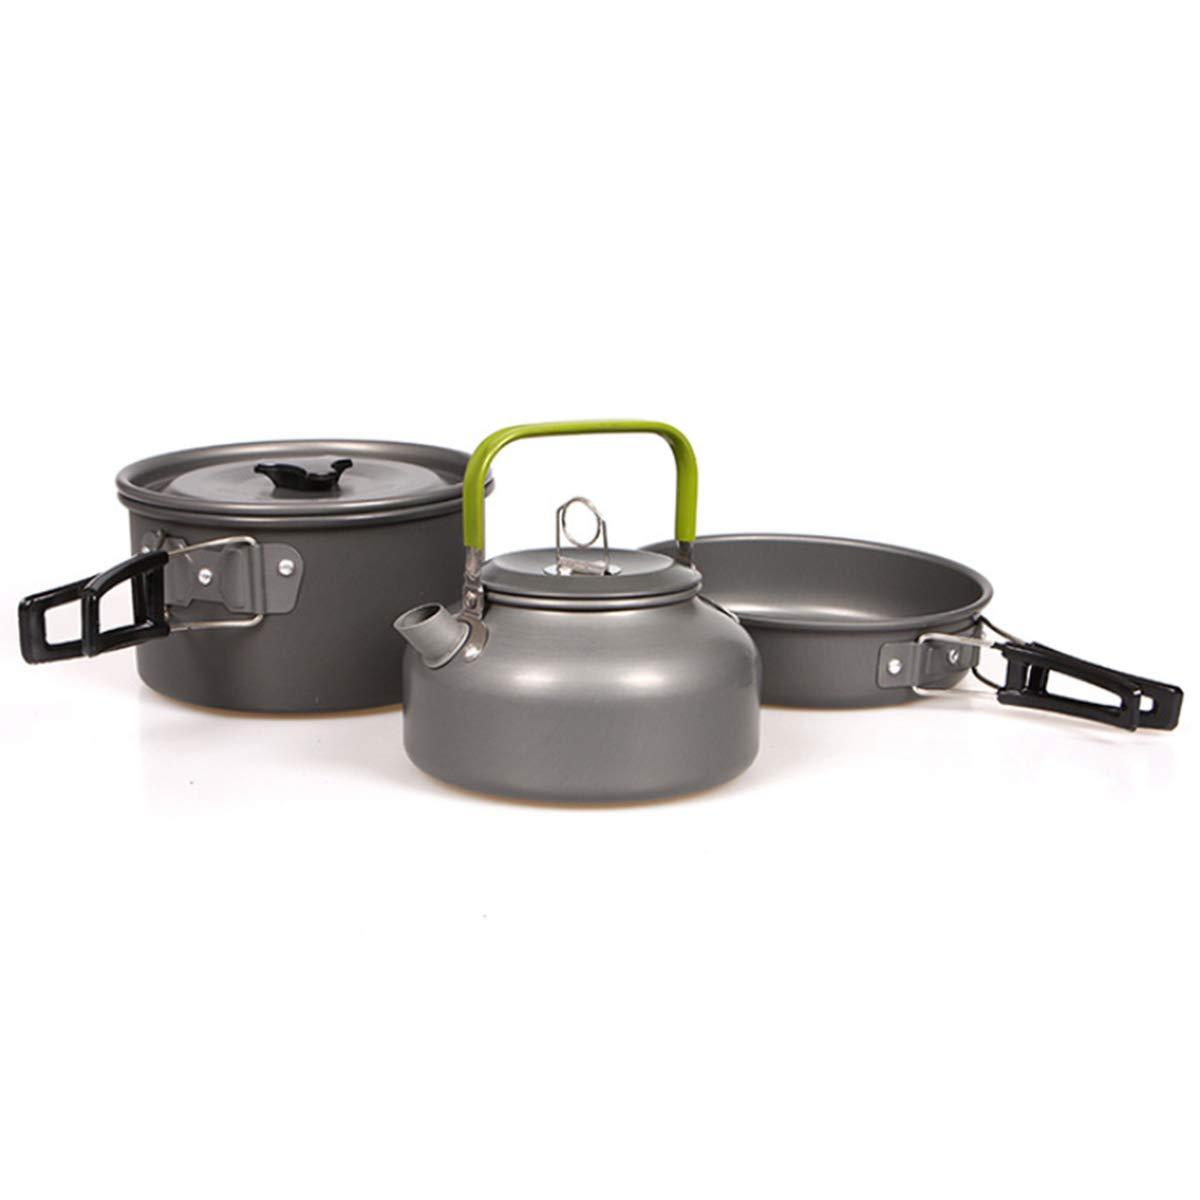 Portable Camping Cookware Set SENREAL Frying Pan Pot Water Kettle Picnic BBQ Cooking Tableware